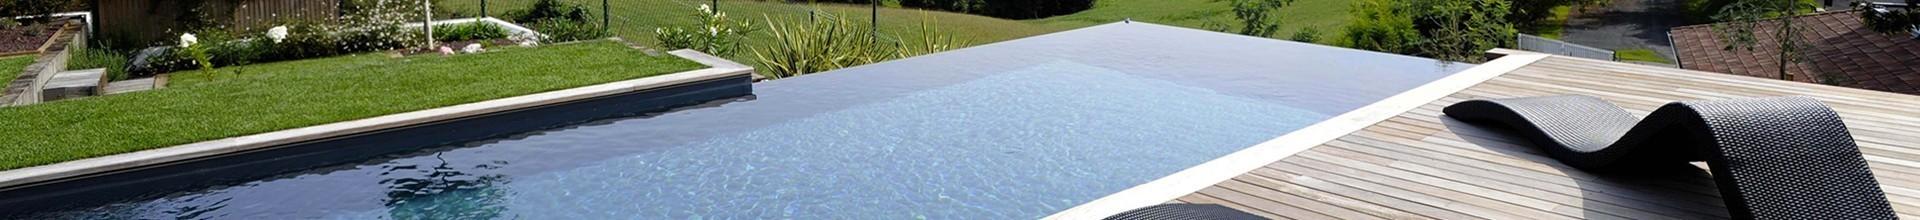 Constructeur piscine discount Corse